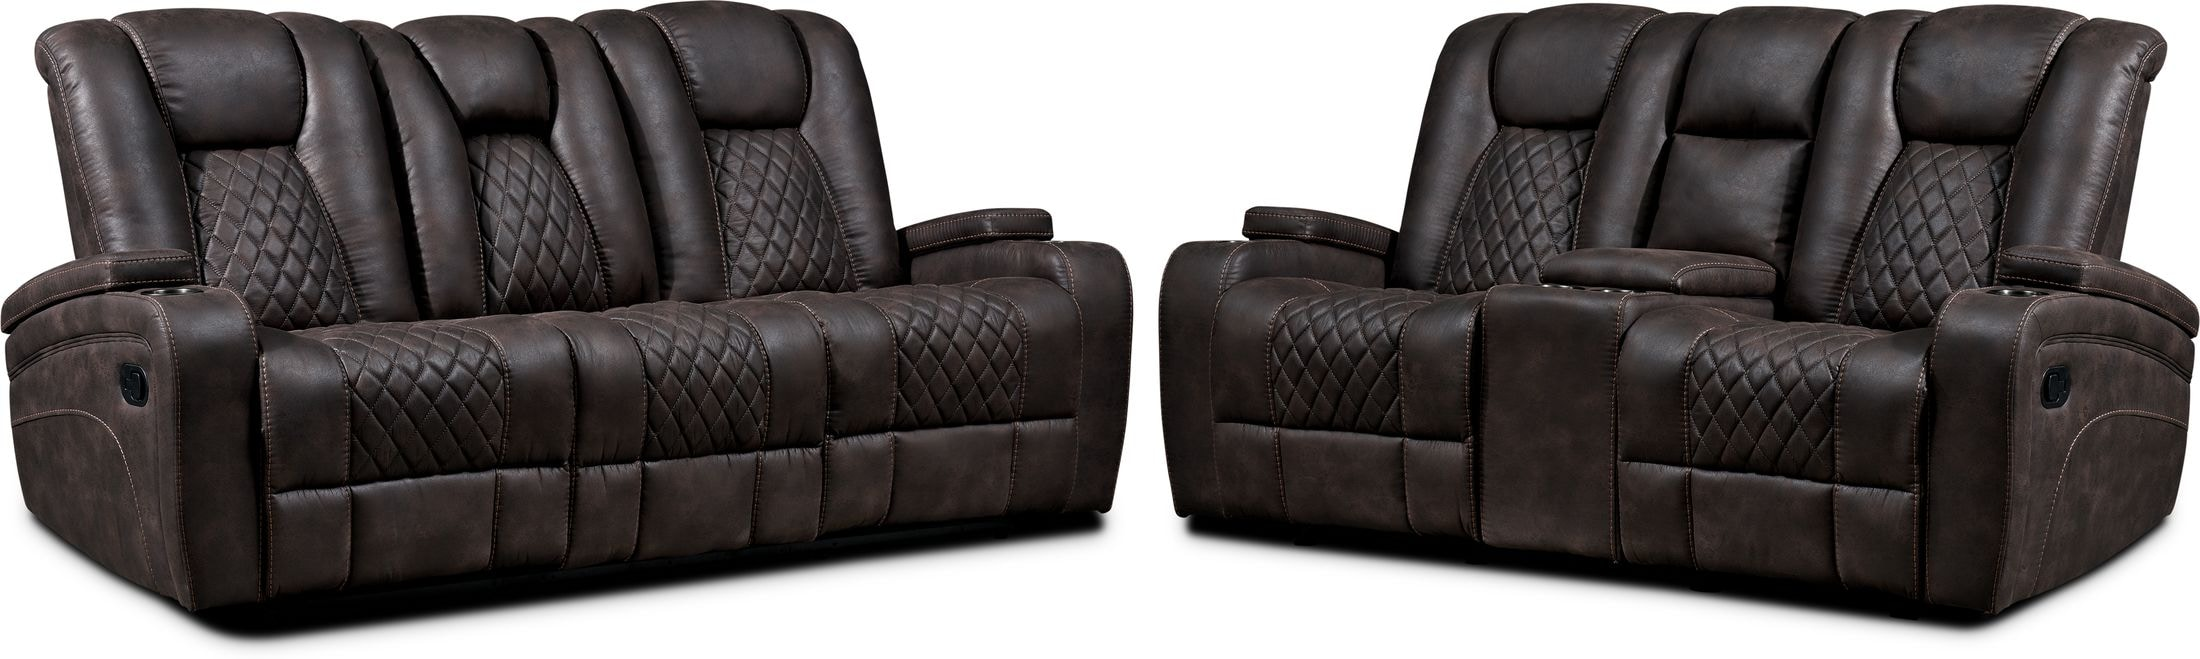 Living Room Furniture - Felix Manual Reclining Sofa and Loveseat - Brown